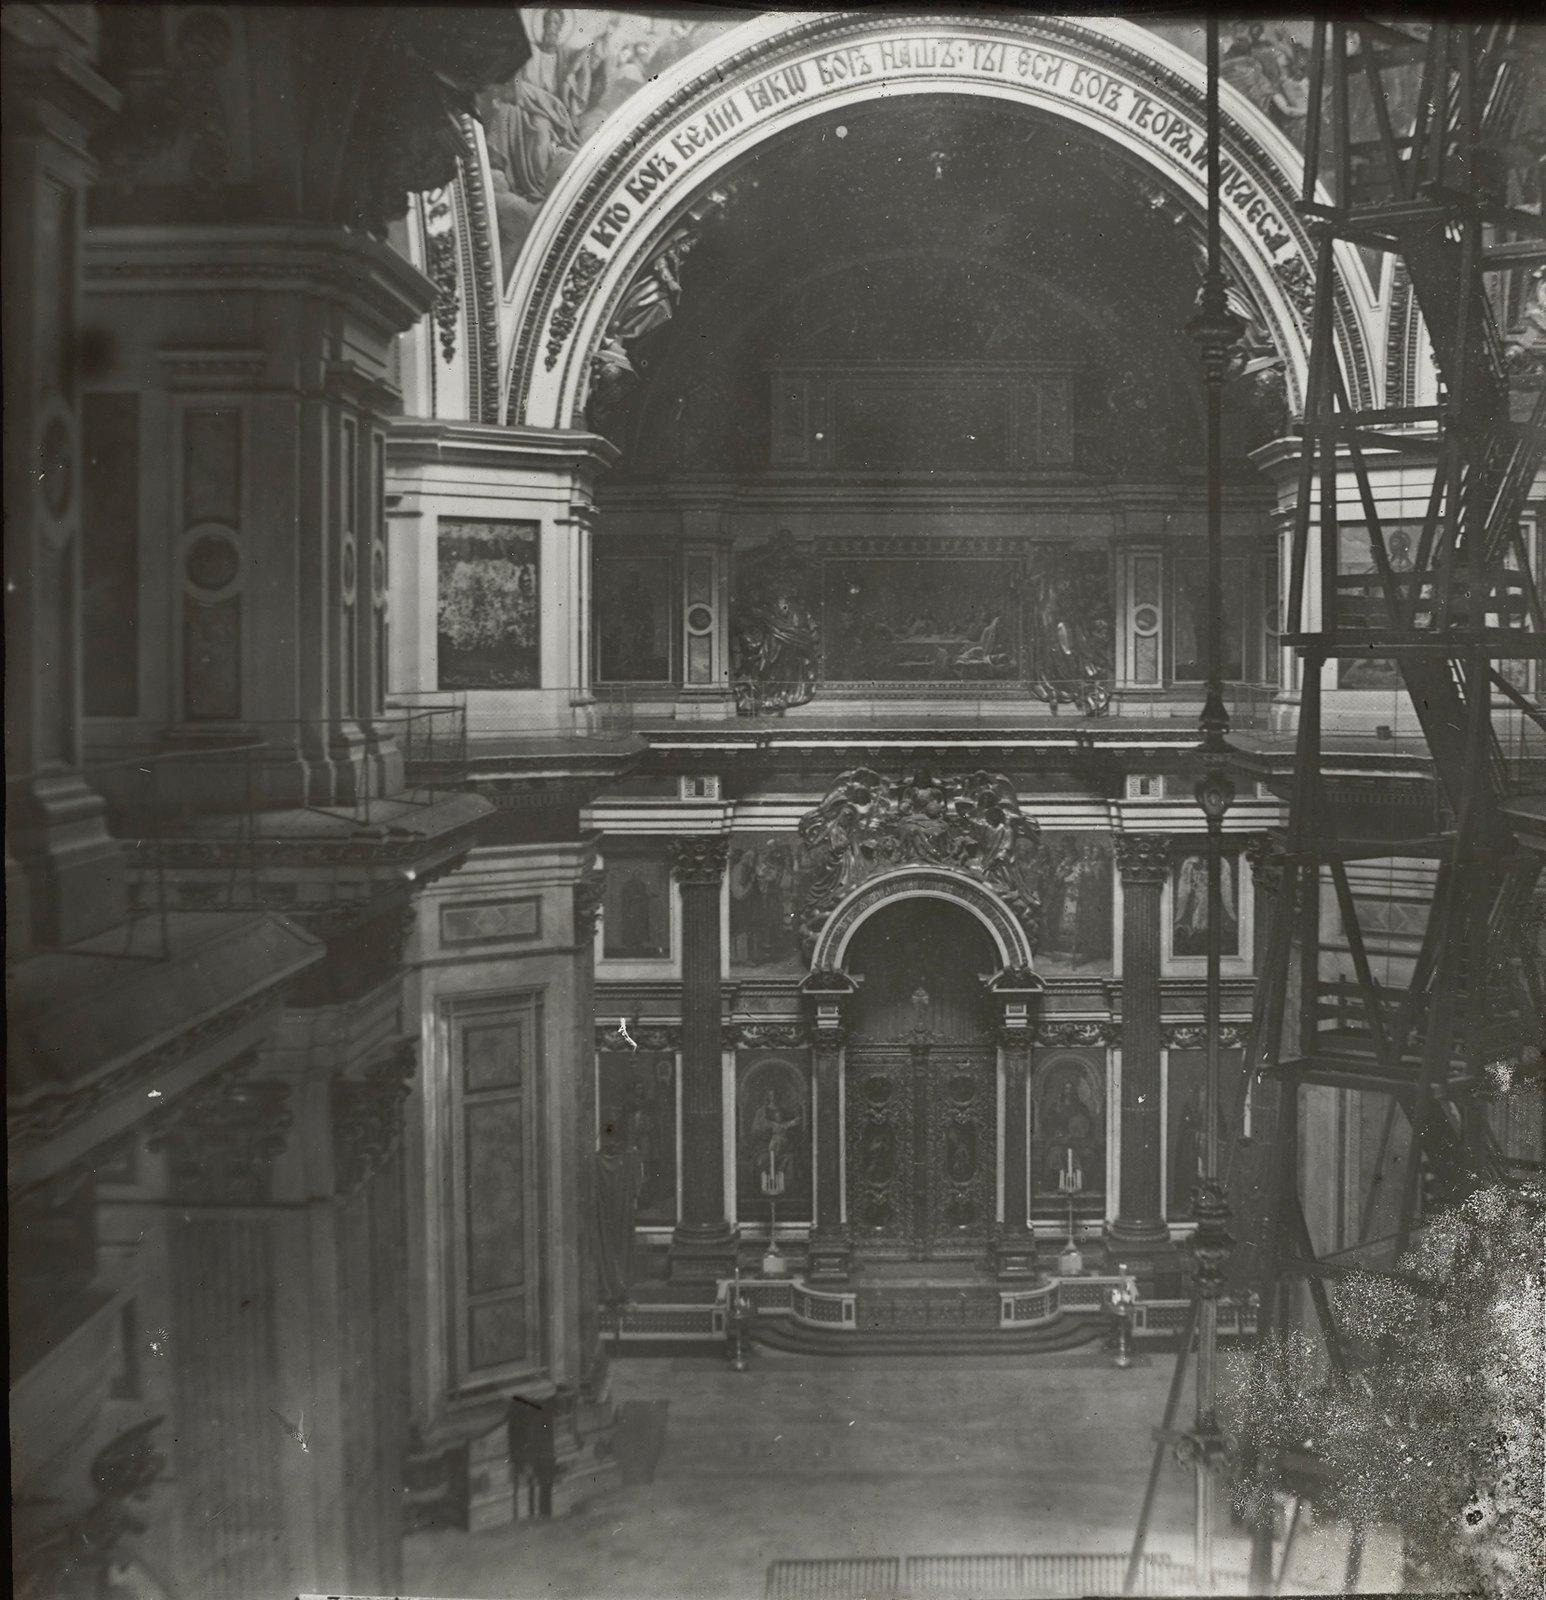 Санкт-Петербург. Интерьер Исаакиевского собора